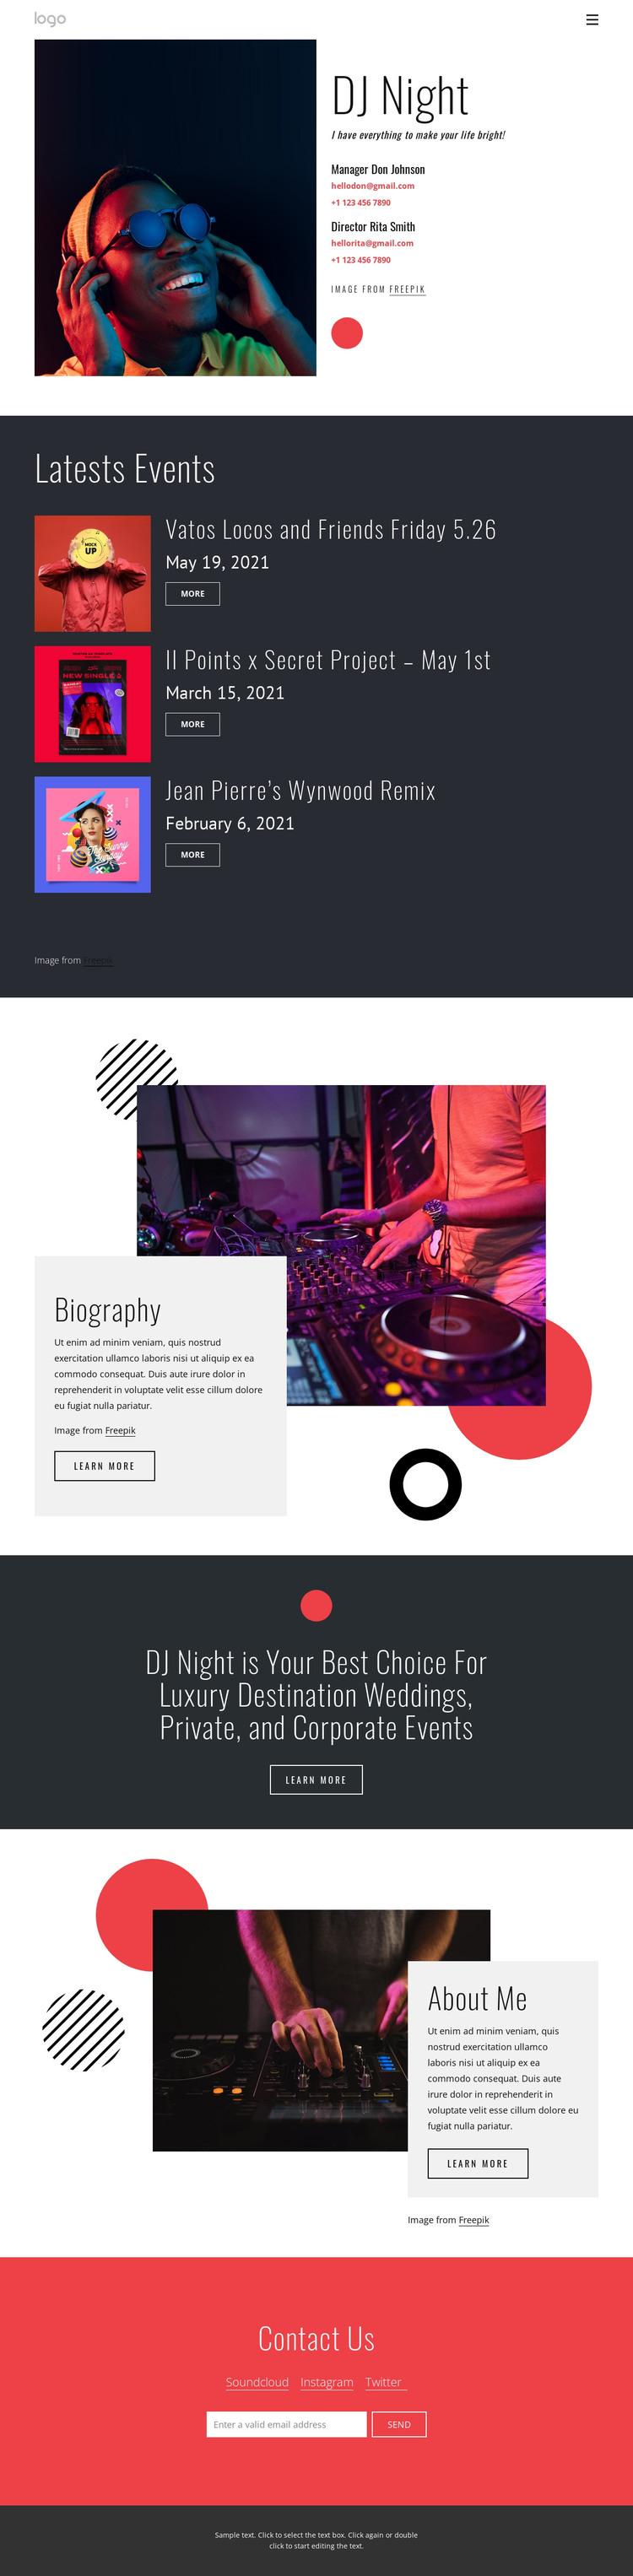 Dj night website HTML Template